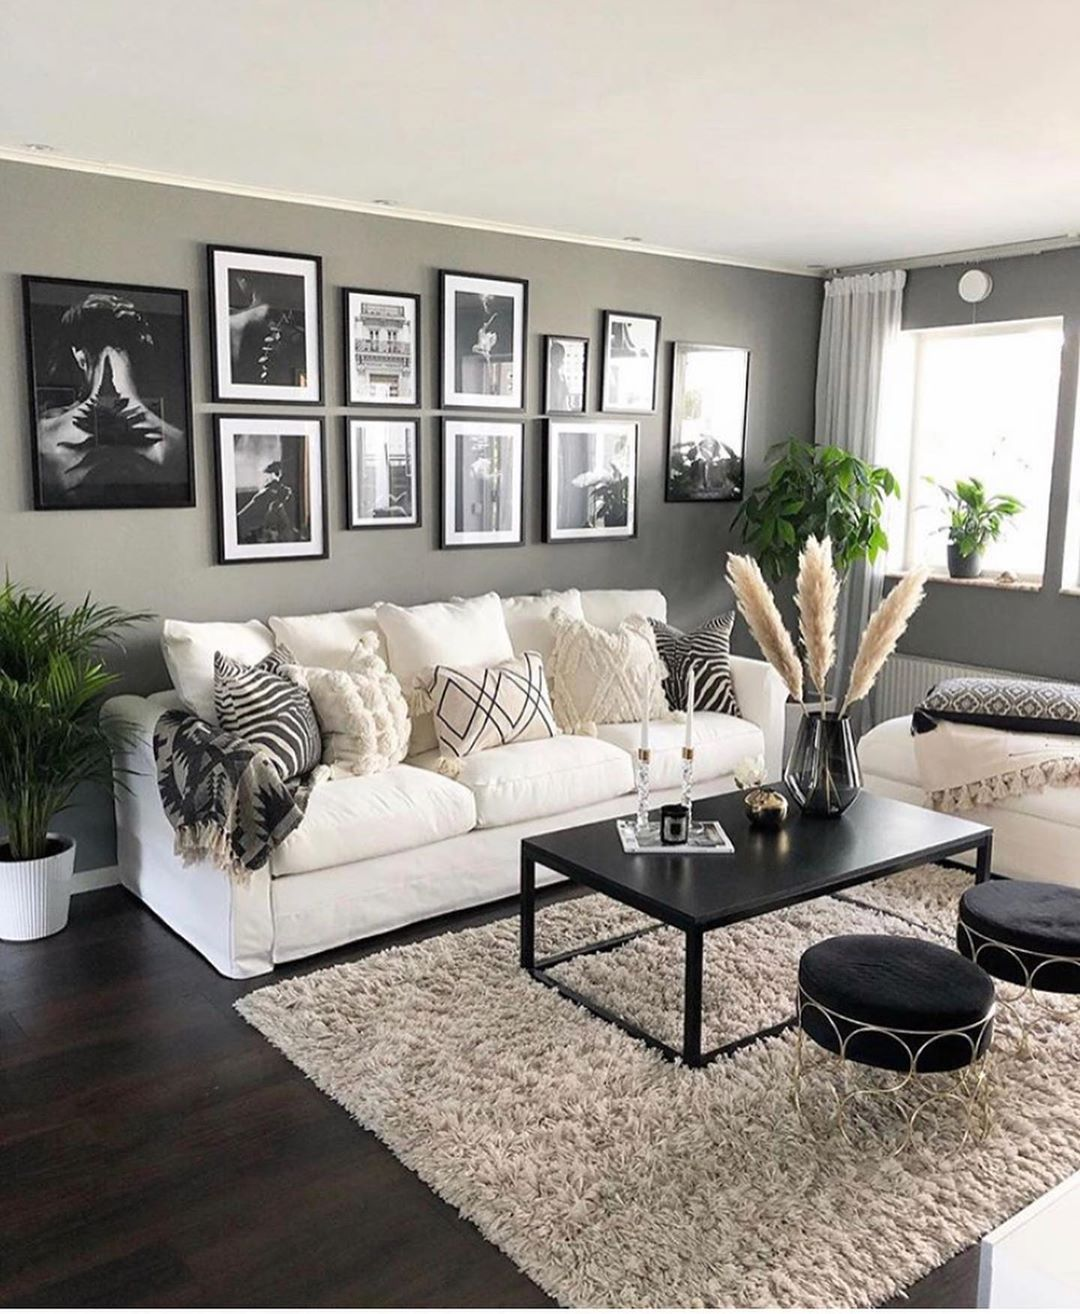 Beautiful Home Decor Inspiration The Welcoming Home Homedecor Livingroom Li Living Room Scandinavian Beautiful Living Rooms Decor Interior Design